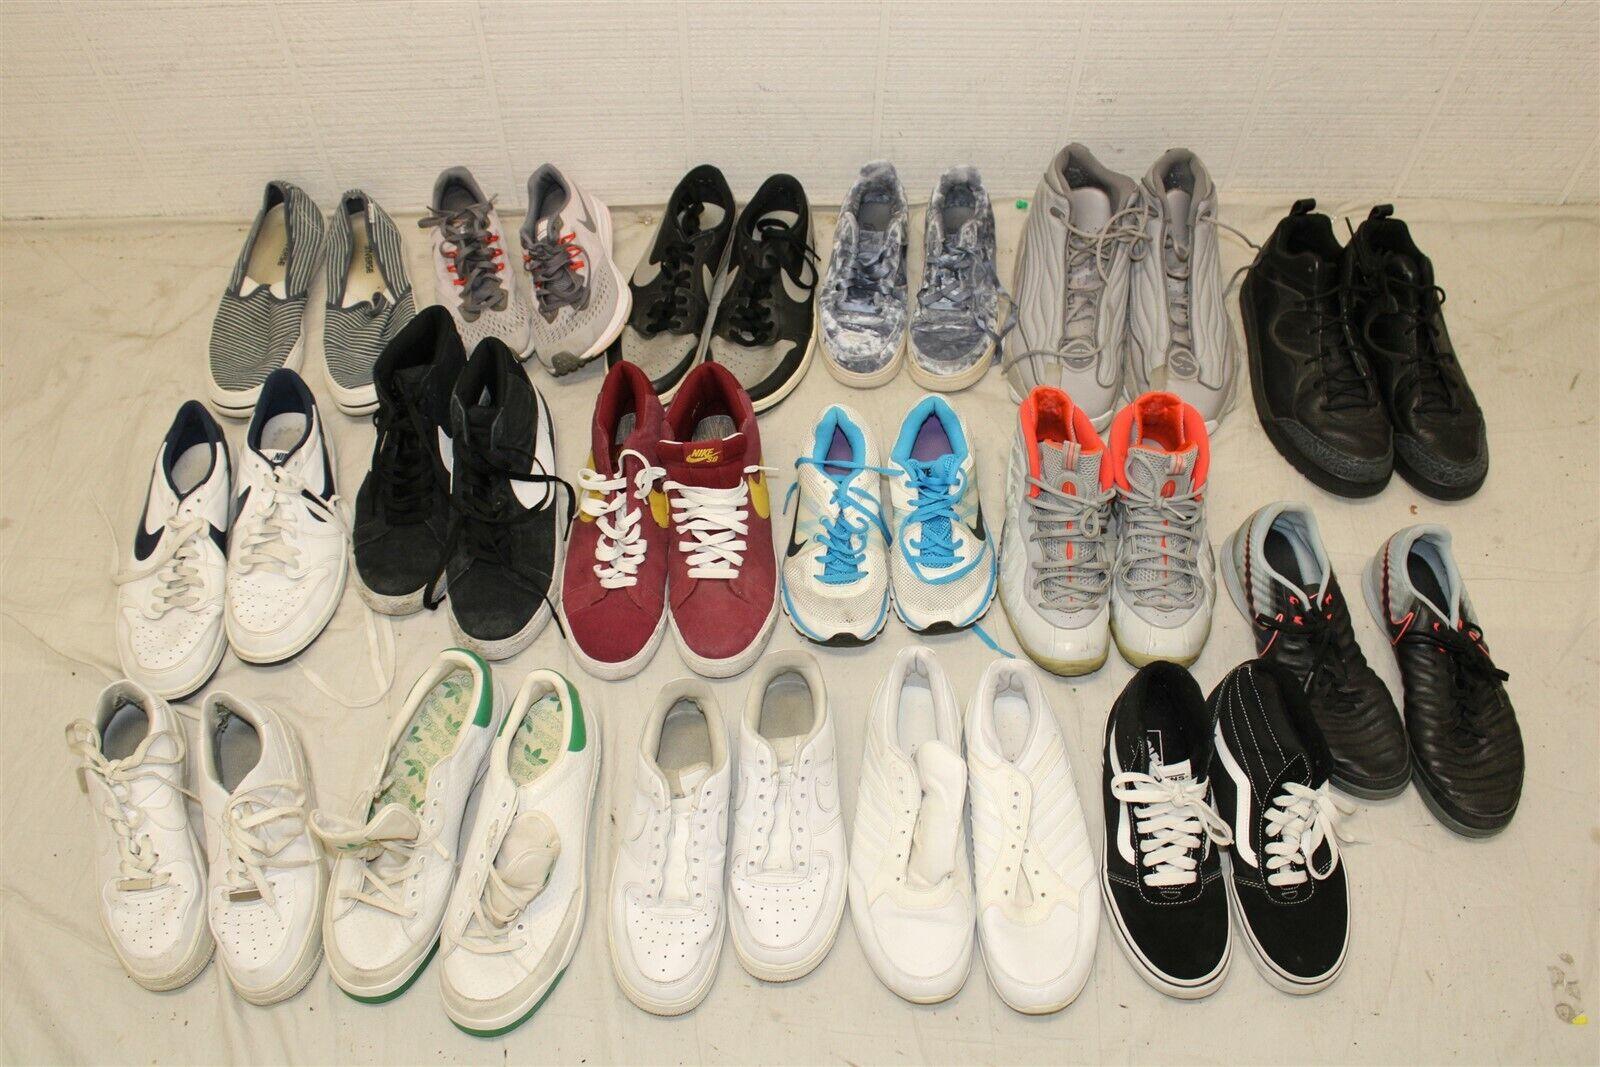 Sport Sneakers Shoes Lot Wholesale Used Rehab Resale Nike Converse HUGE Lot